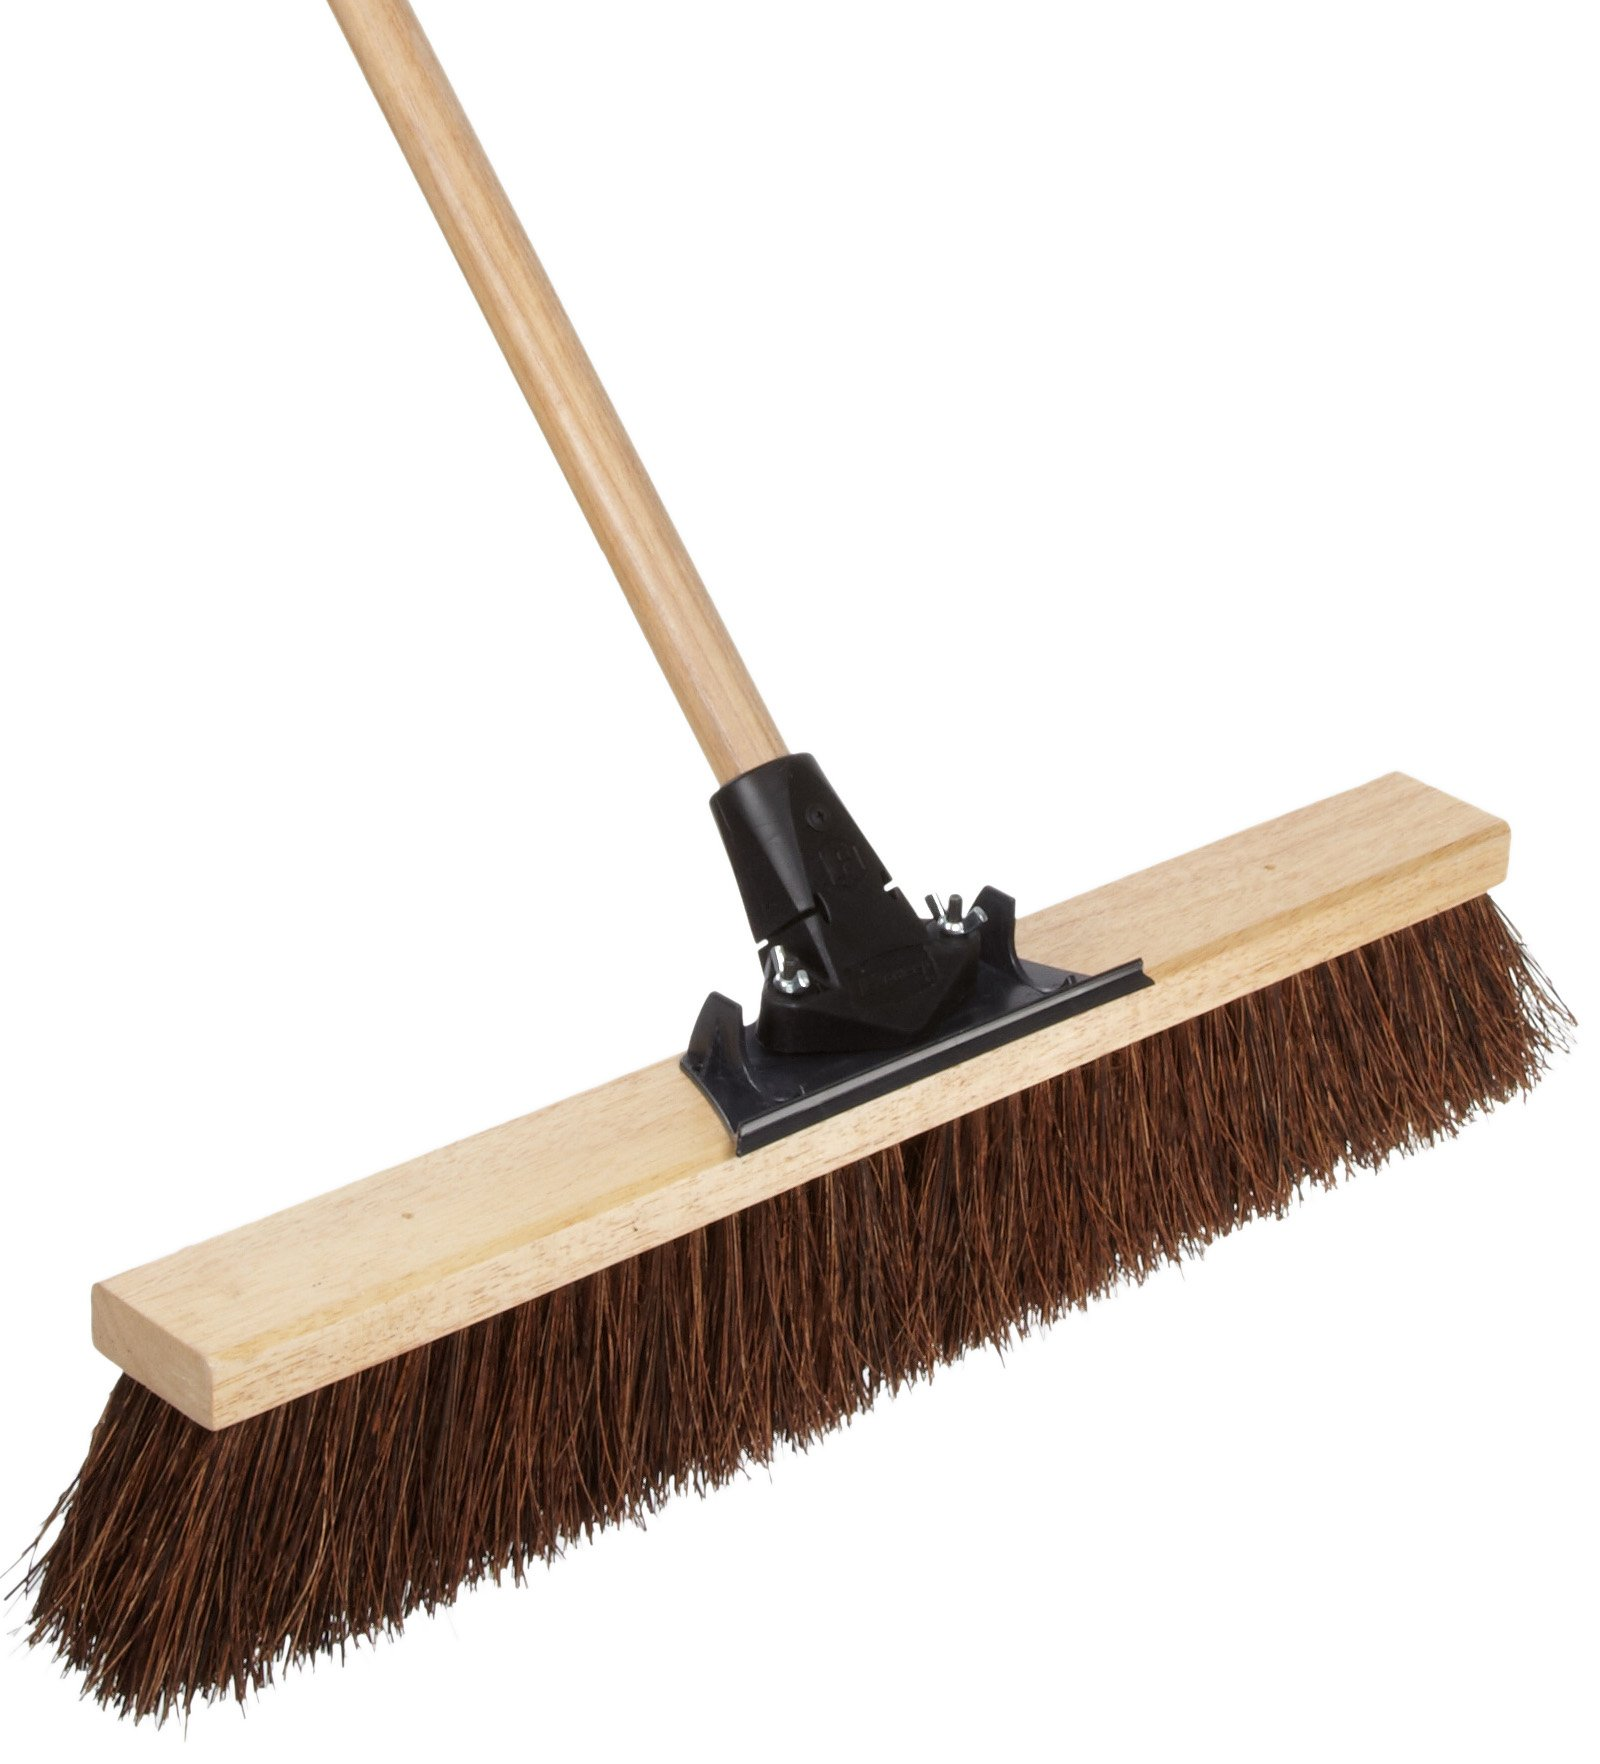 Weiler 44601 Palmyra Fiber Pro-Flex Sweep with Wood Handle, 2-1/2 Head Width by Weiler